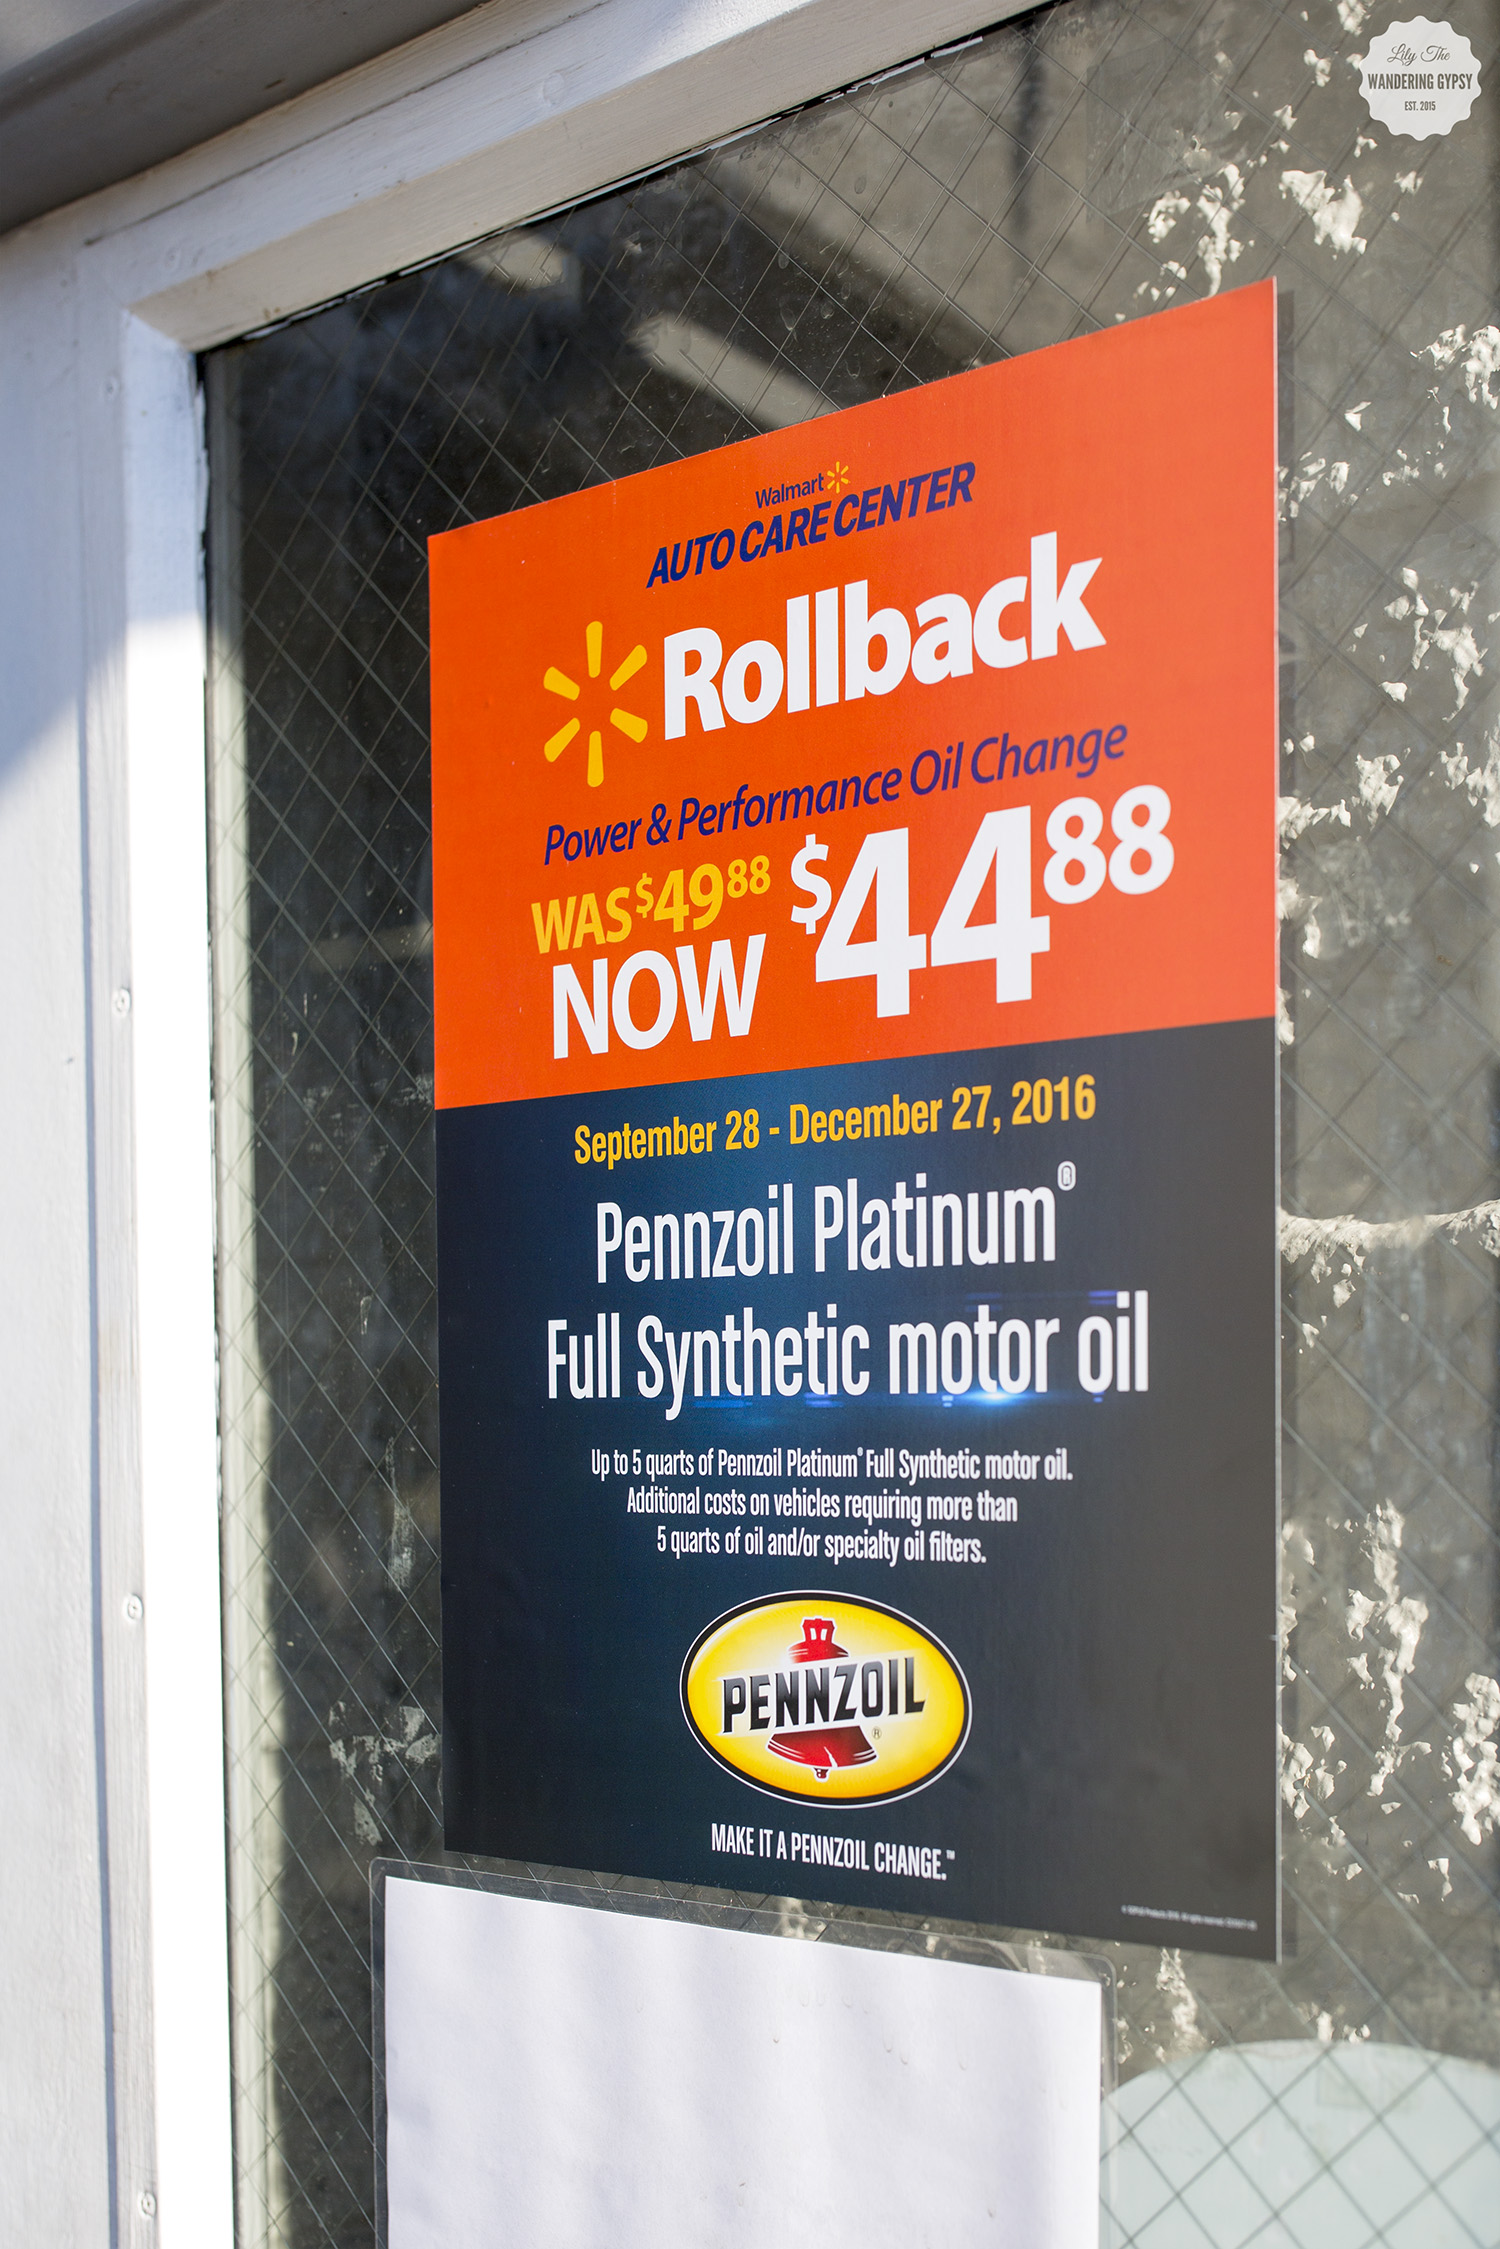 Pennzoil at Walmart #FallForPennzoil